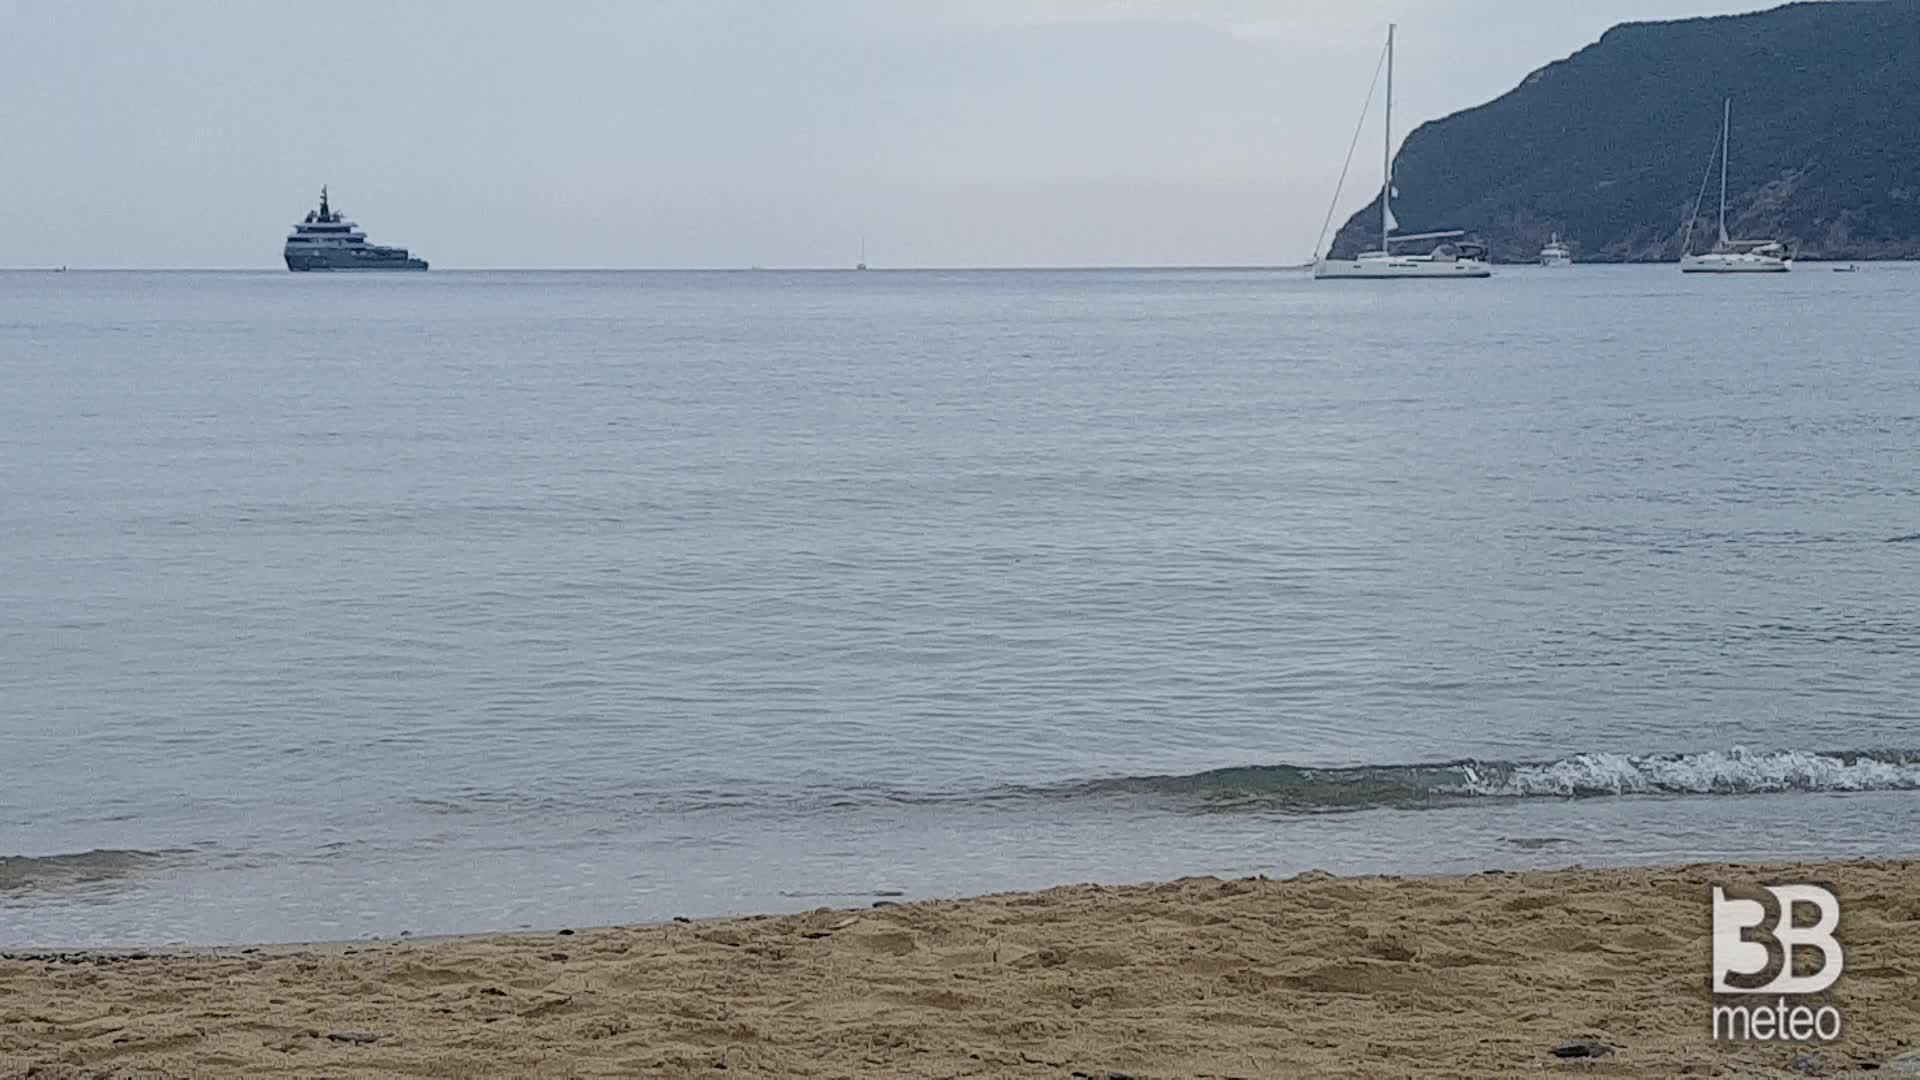 Cronaca meteo video: NUBI IN AUMENTO sull'Isola d'Elba